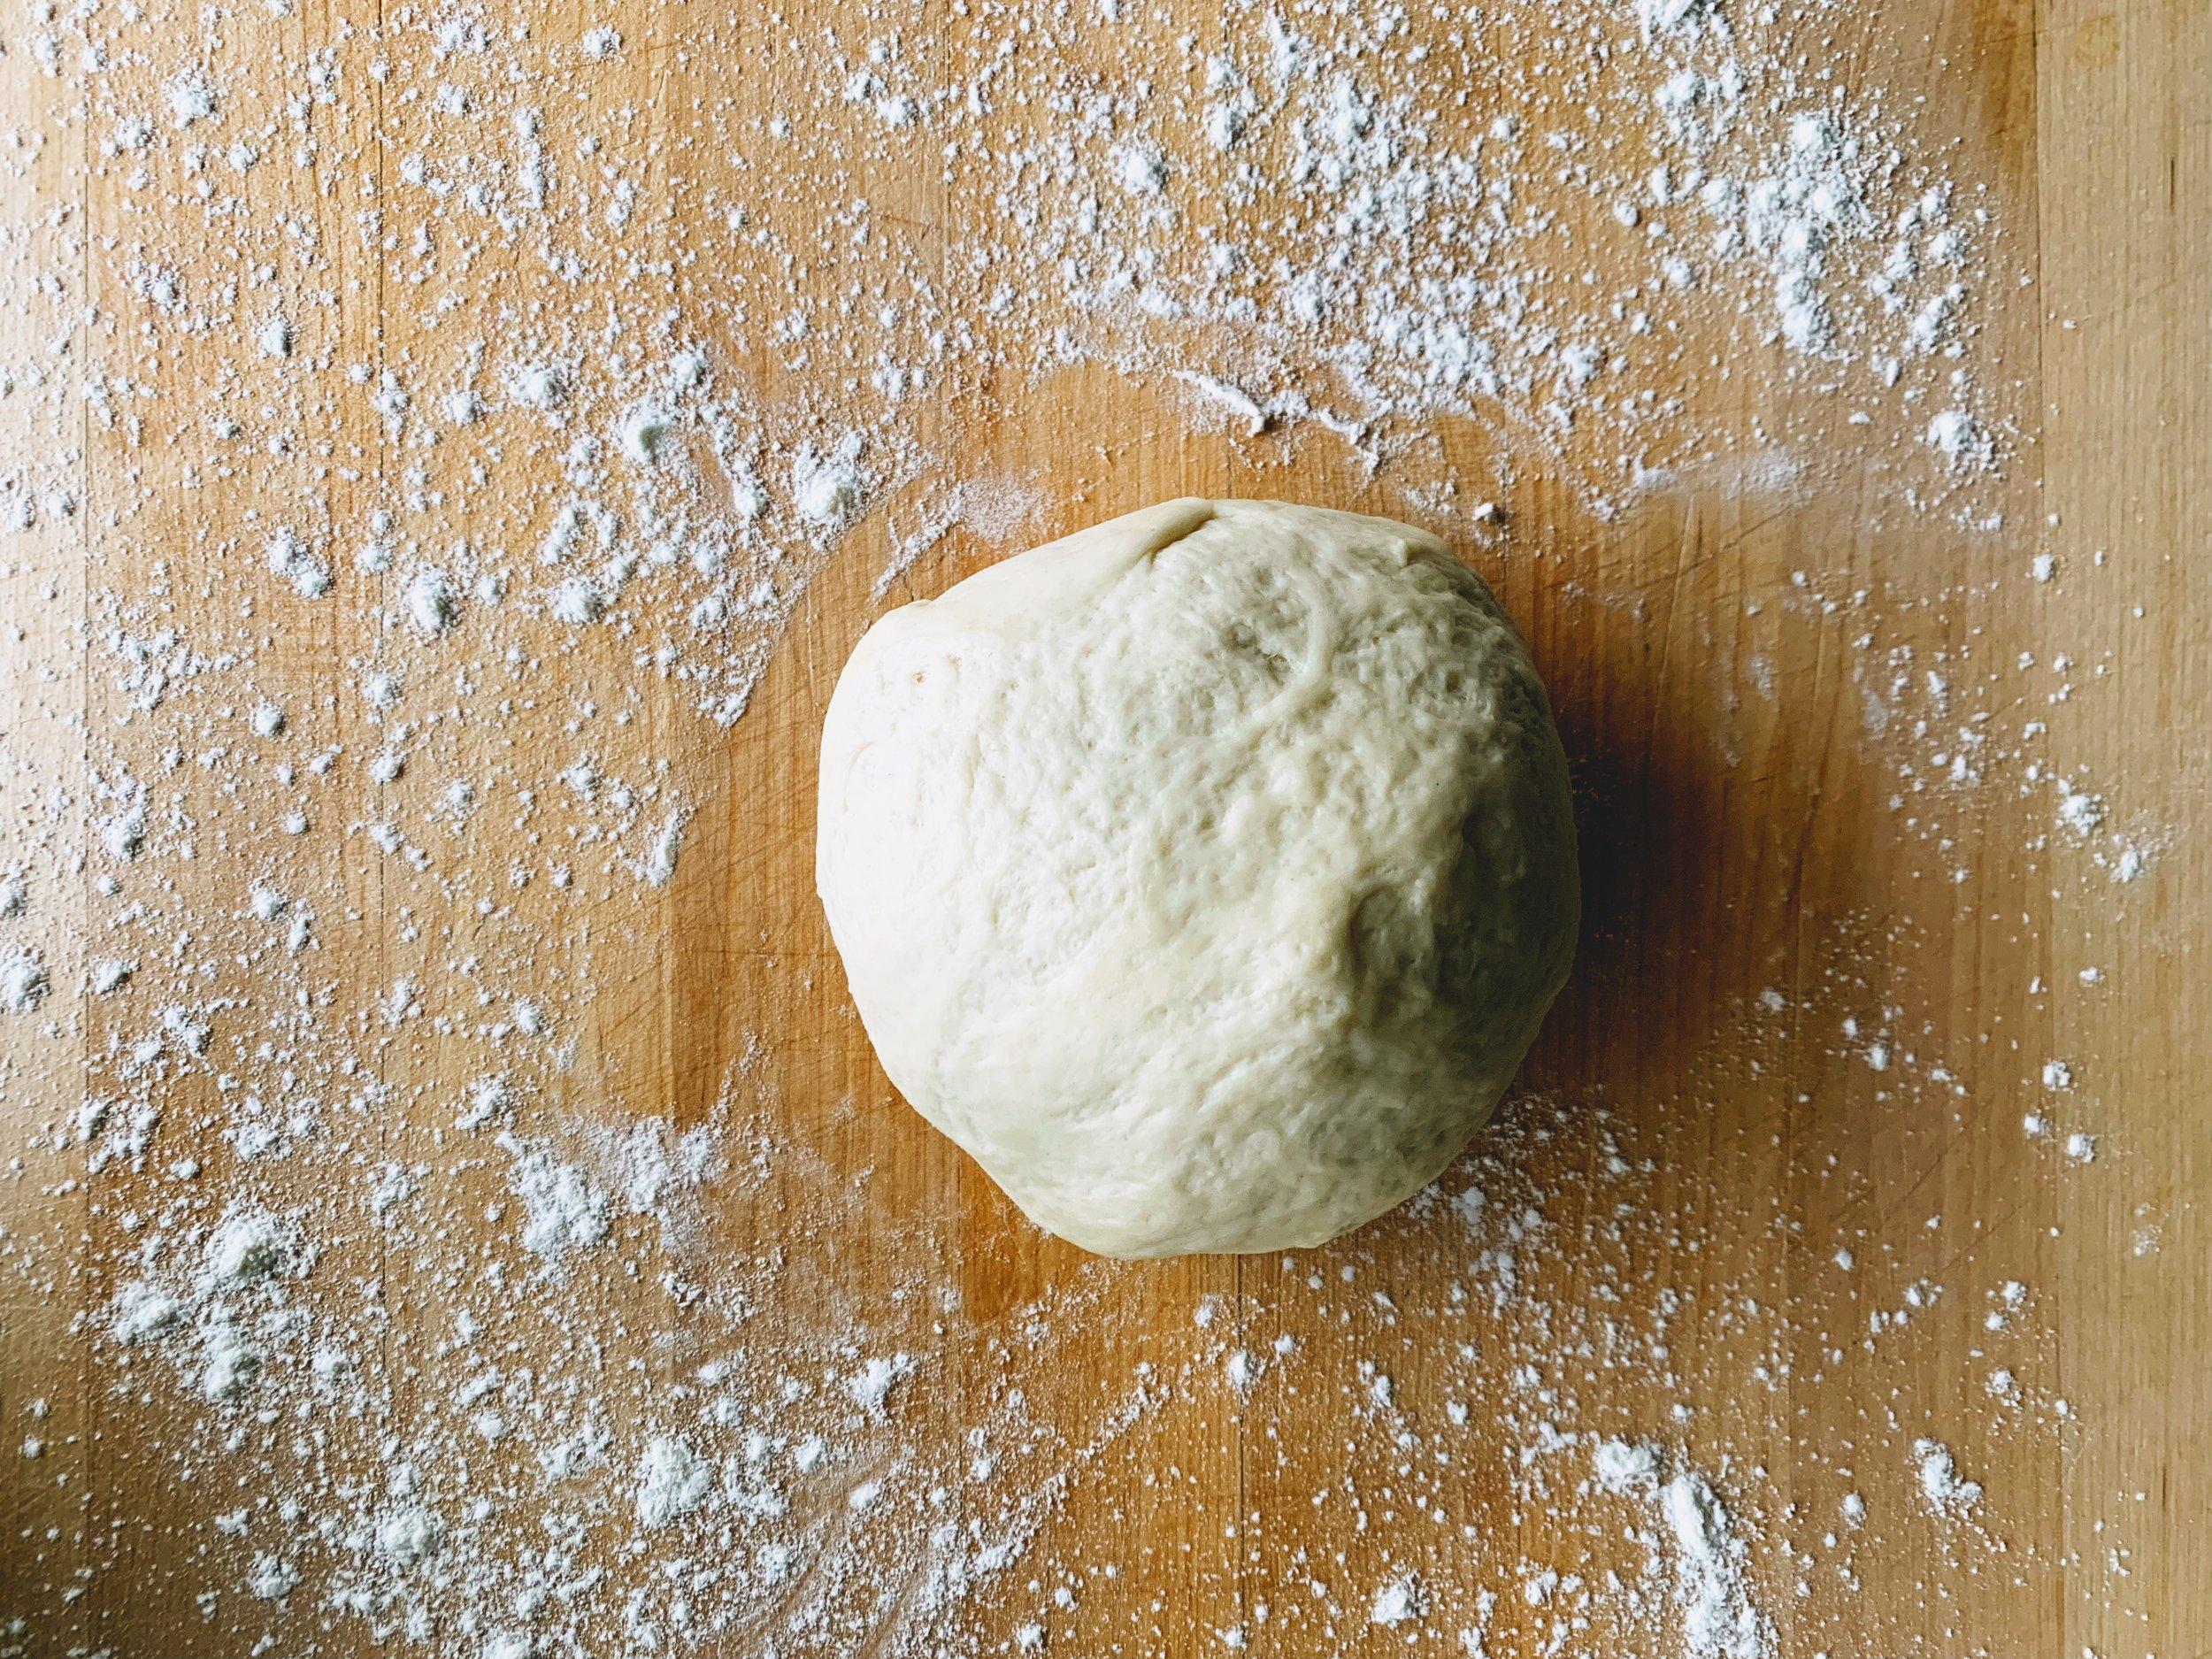 Chicago Thin  Crust Pizza Dough up close.jpg